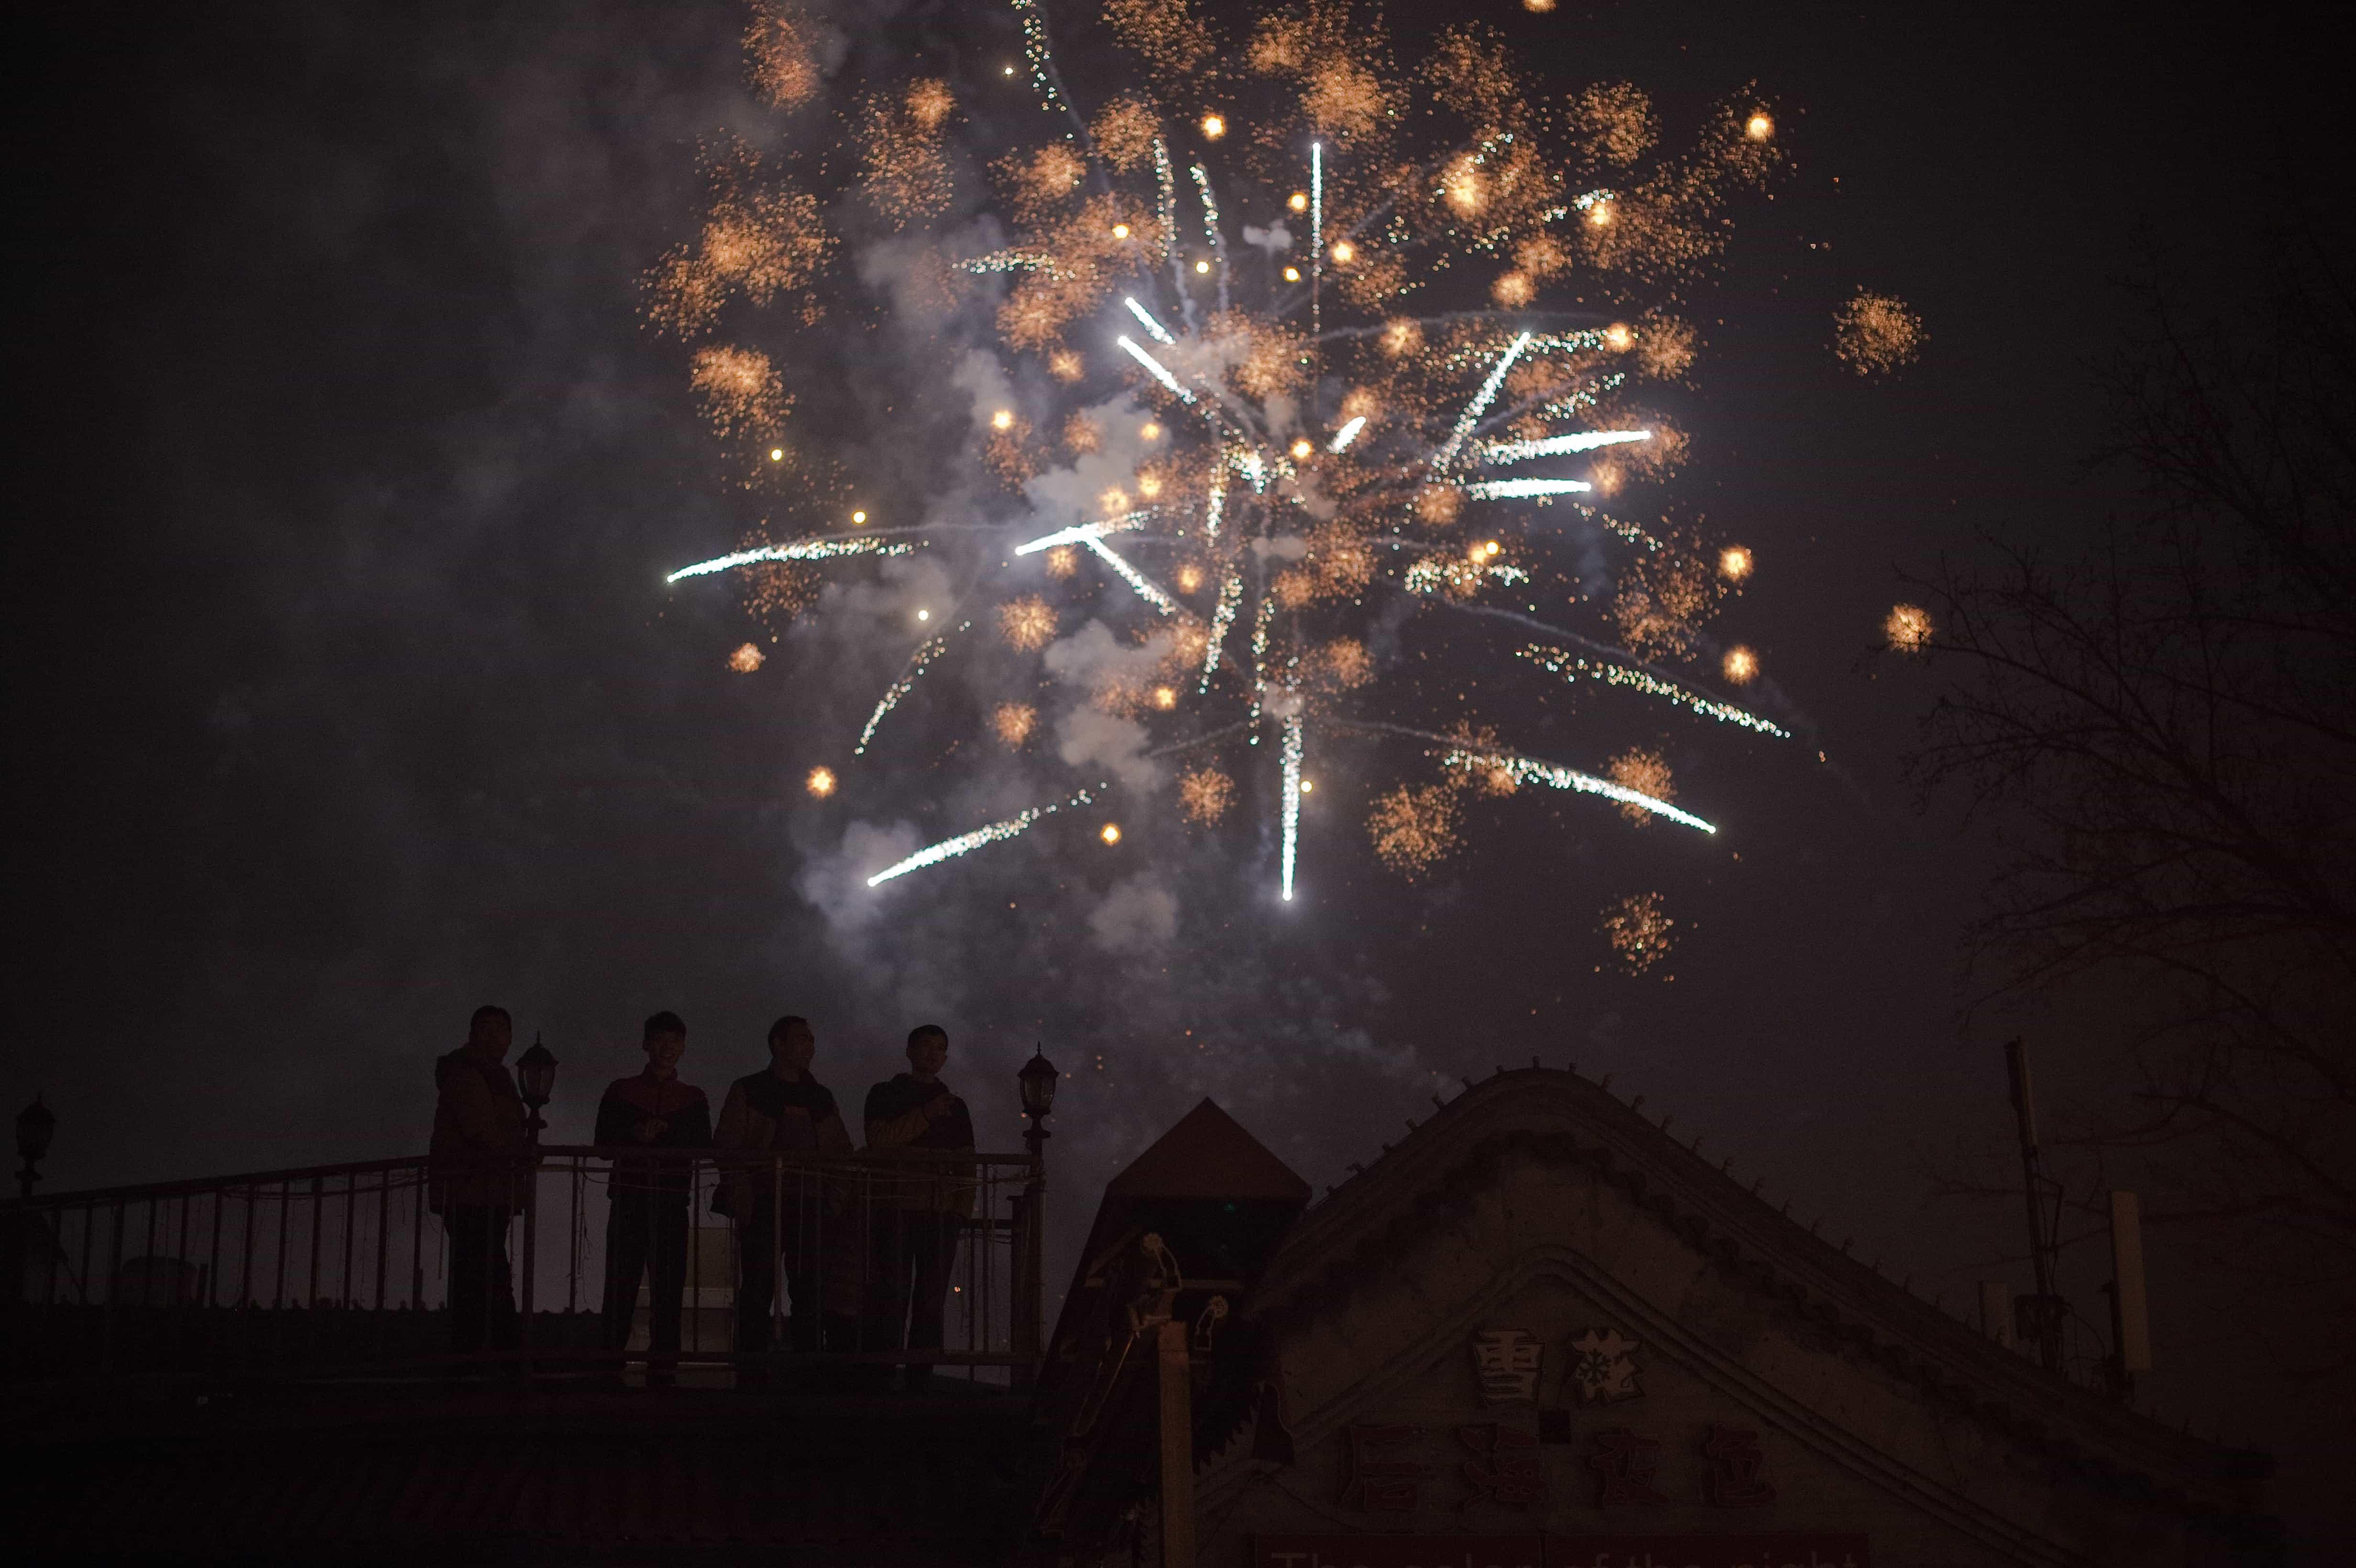 CHINA-LUNAR-NEW-YEAR